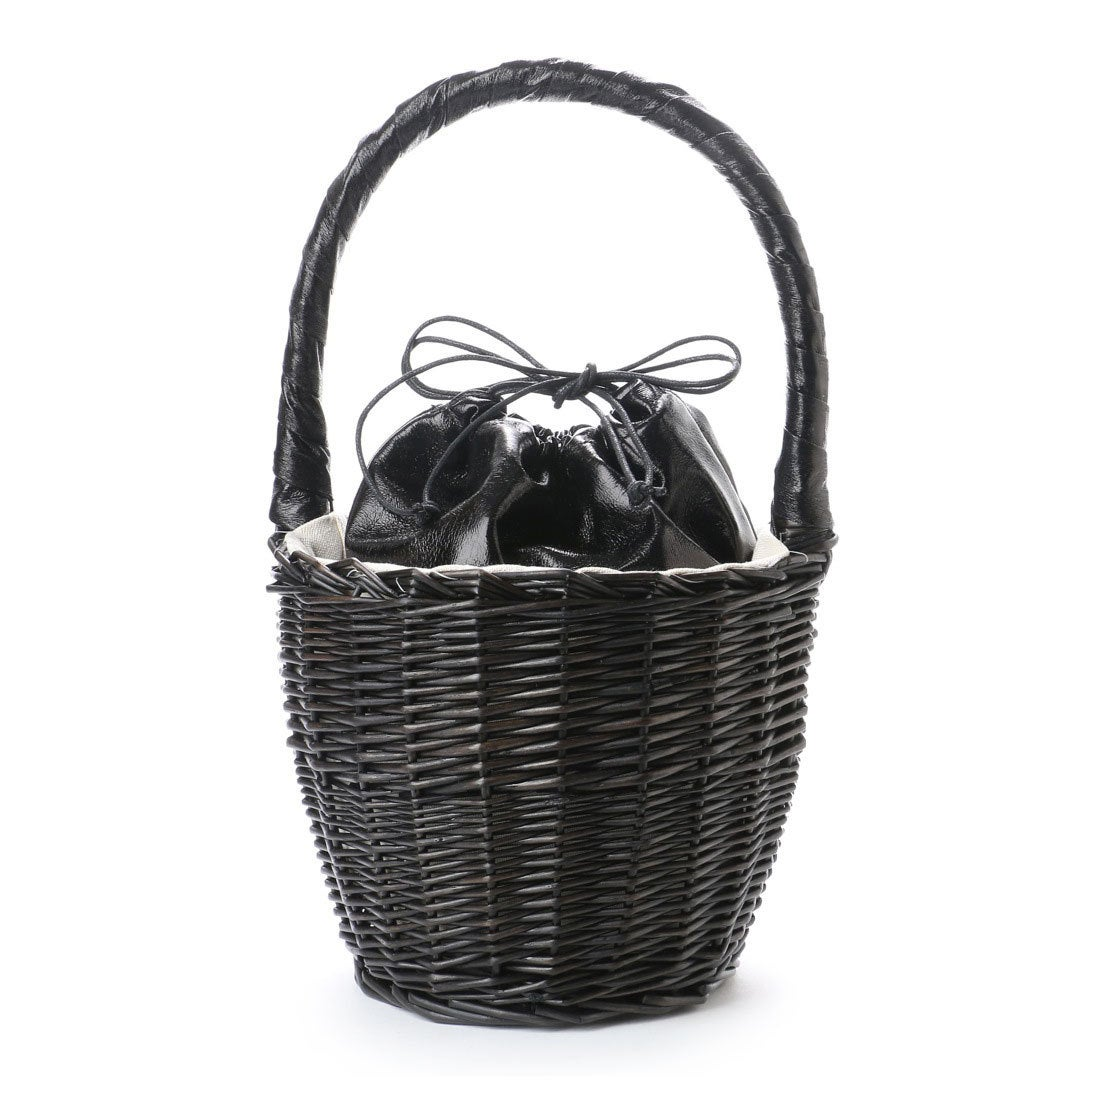 【EVOL】ILIMA Casselini メタリック巾着かごバッグ (ブラック) レディース